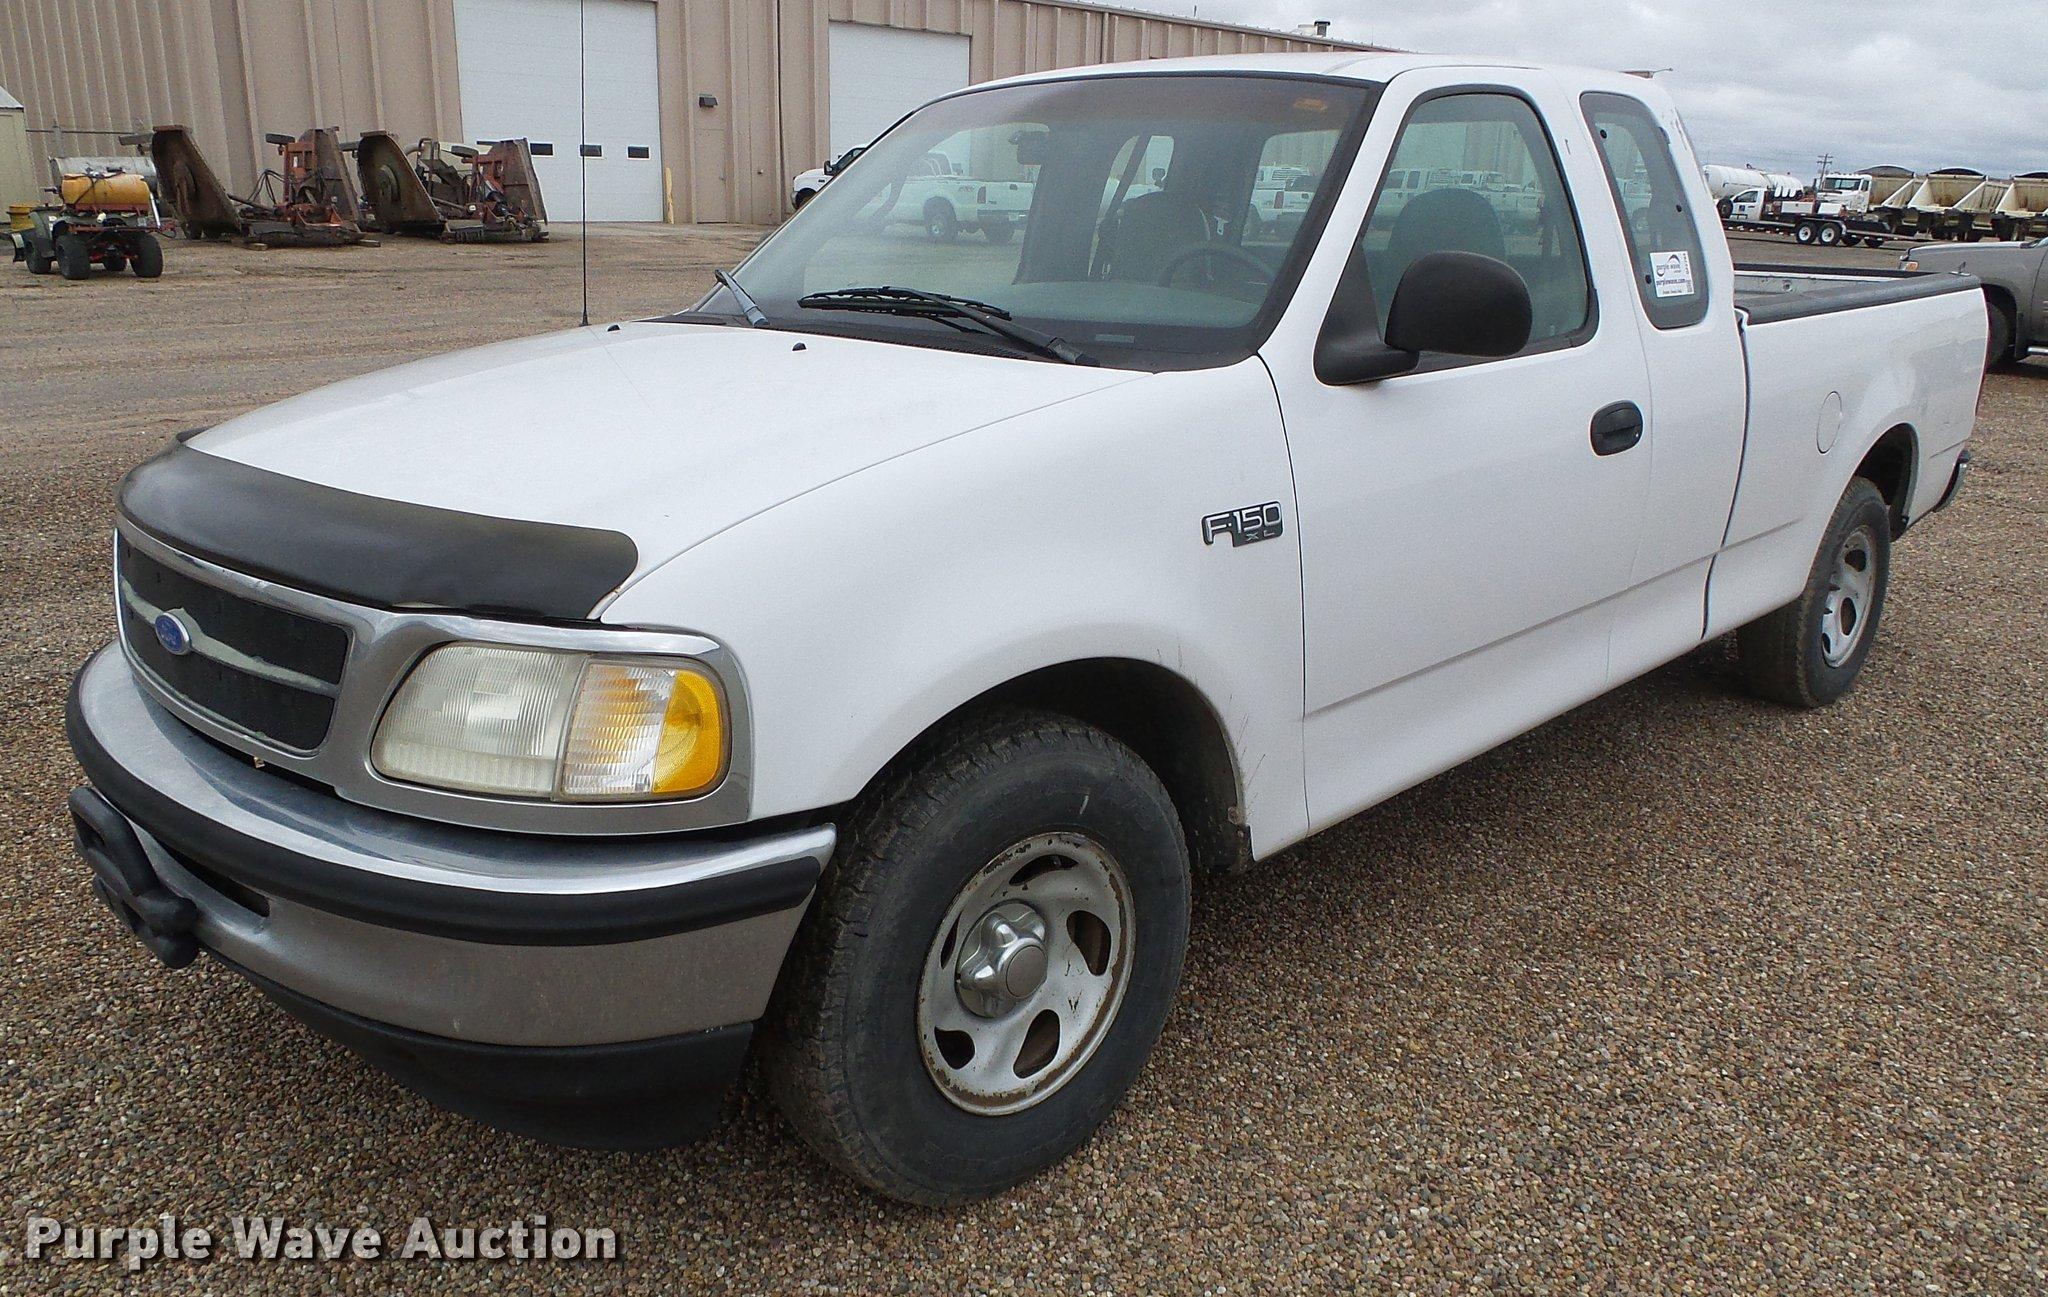 1997 ford f150 xl supercab pickup truck | item df2794 | sold